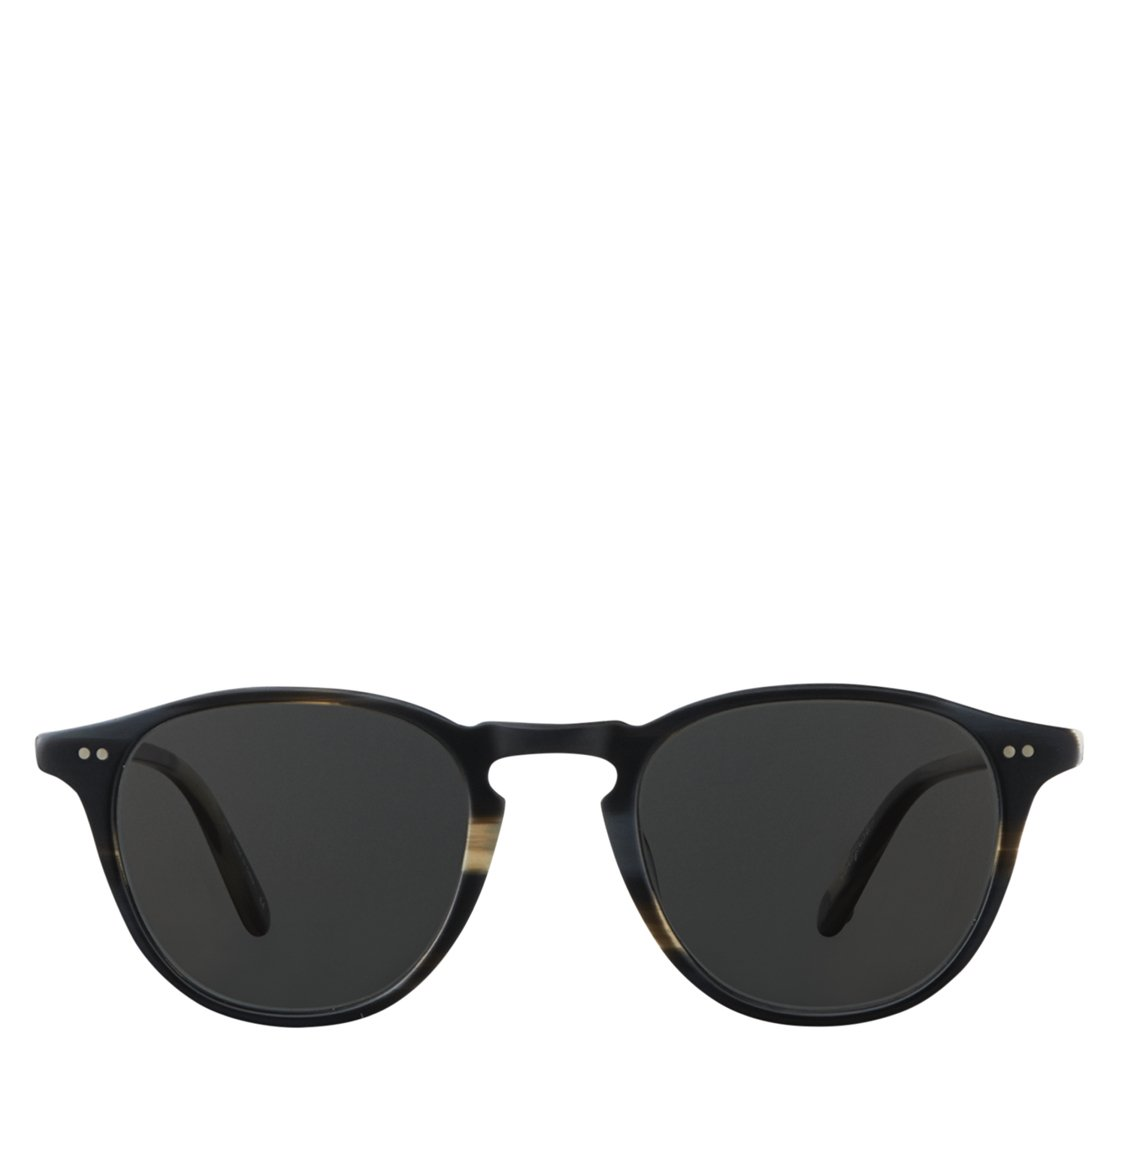 Garrett Leight Square Black Tortoise Acetate Γυαλιά Ηλίου